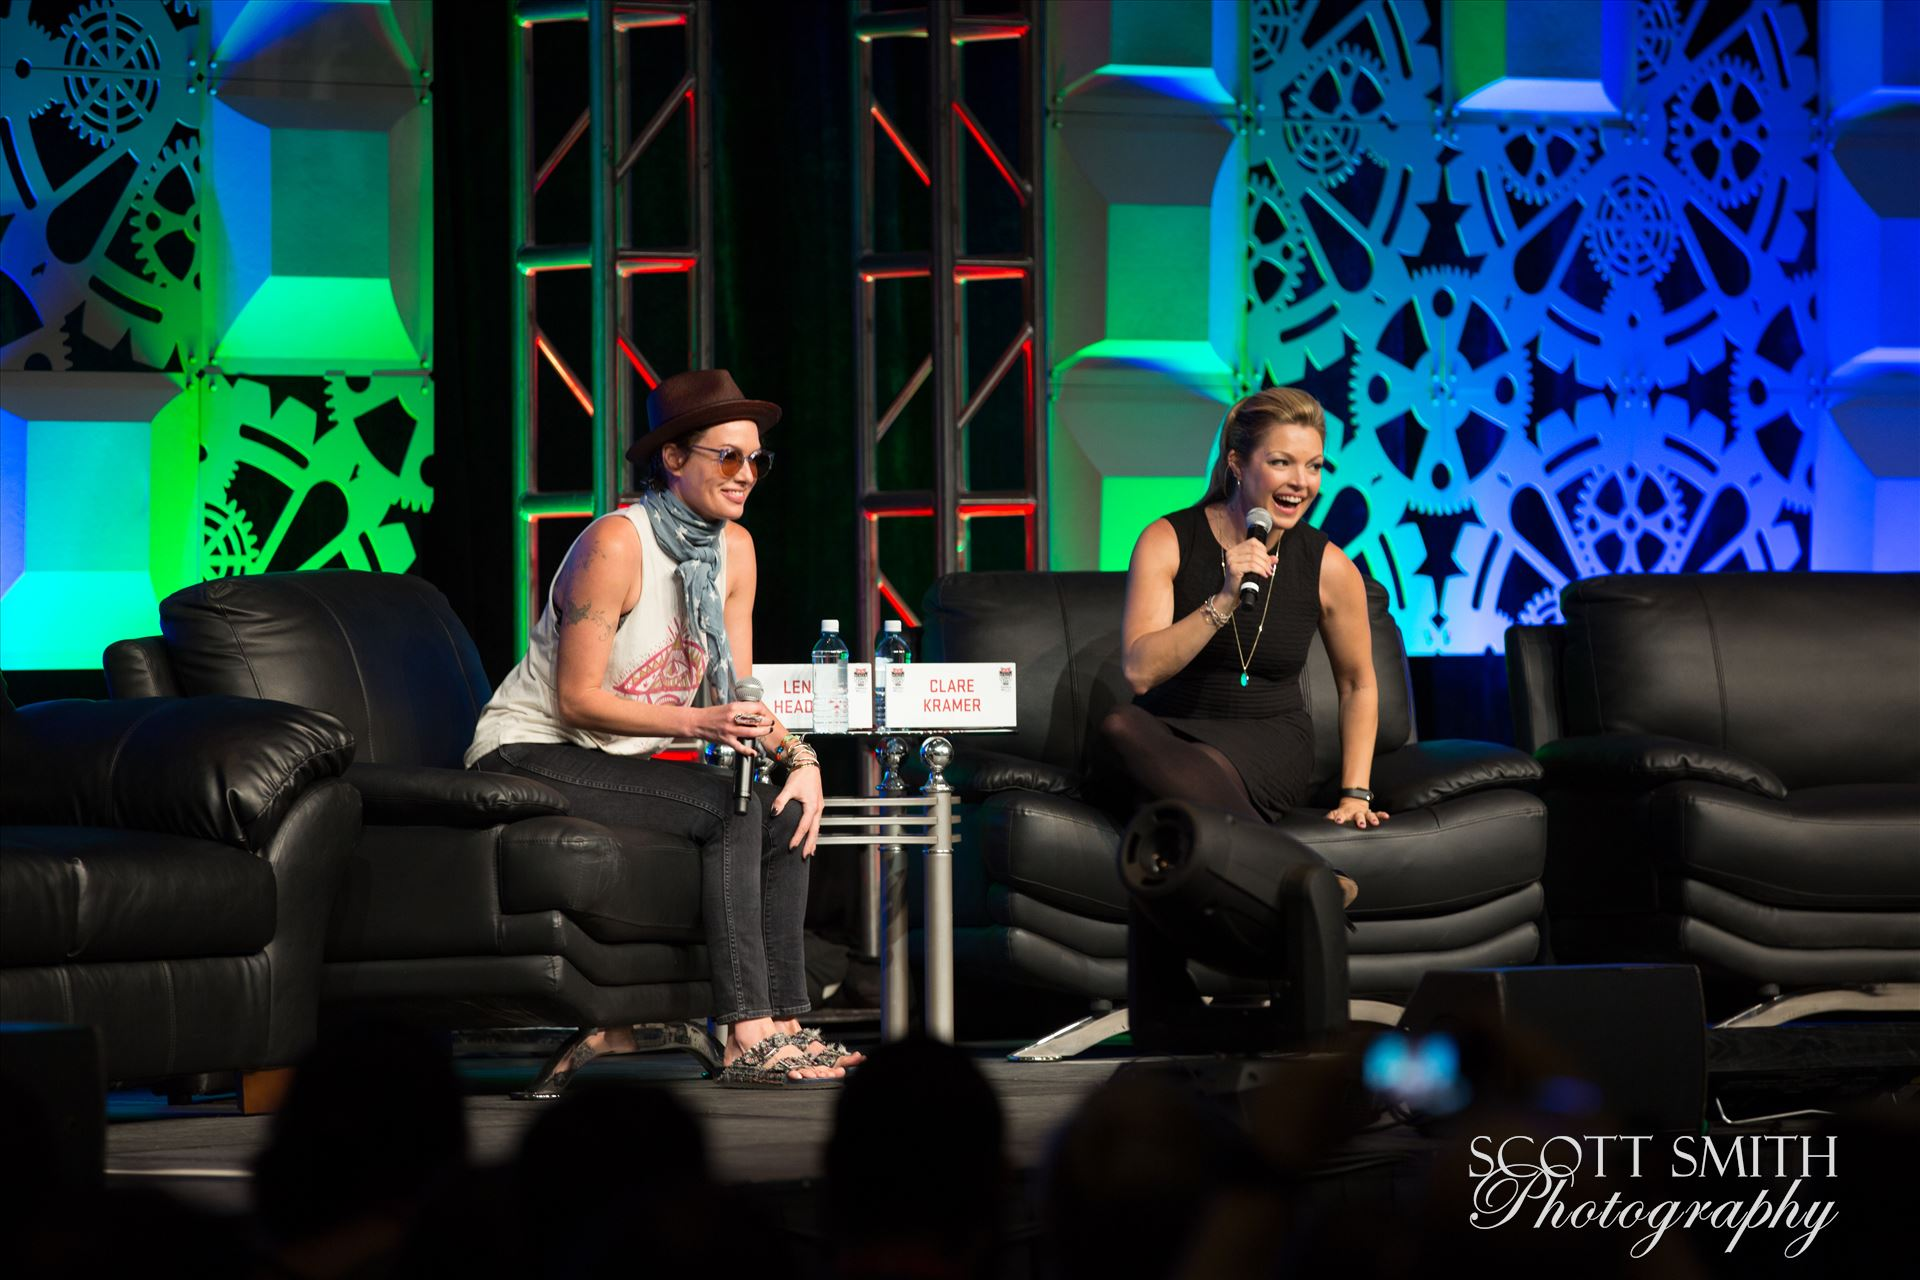 Denver Comic Con 2016 03 - Denver Comic Con 2016 at the Colorado Convention Center. Clare Kramer and Lena Headey. by D Scott Smith